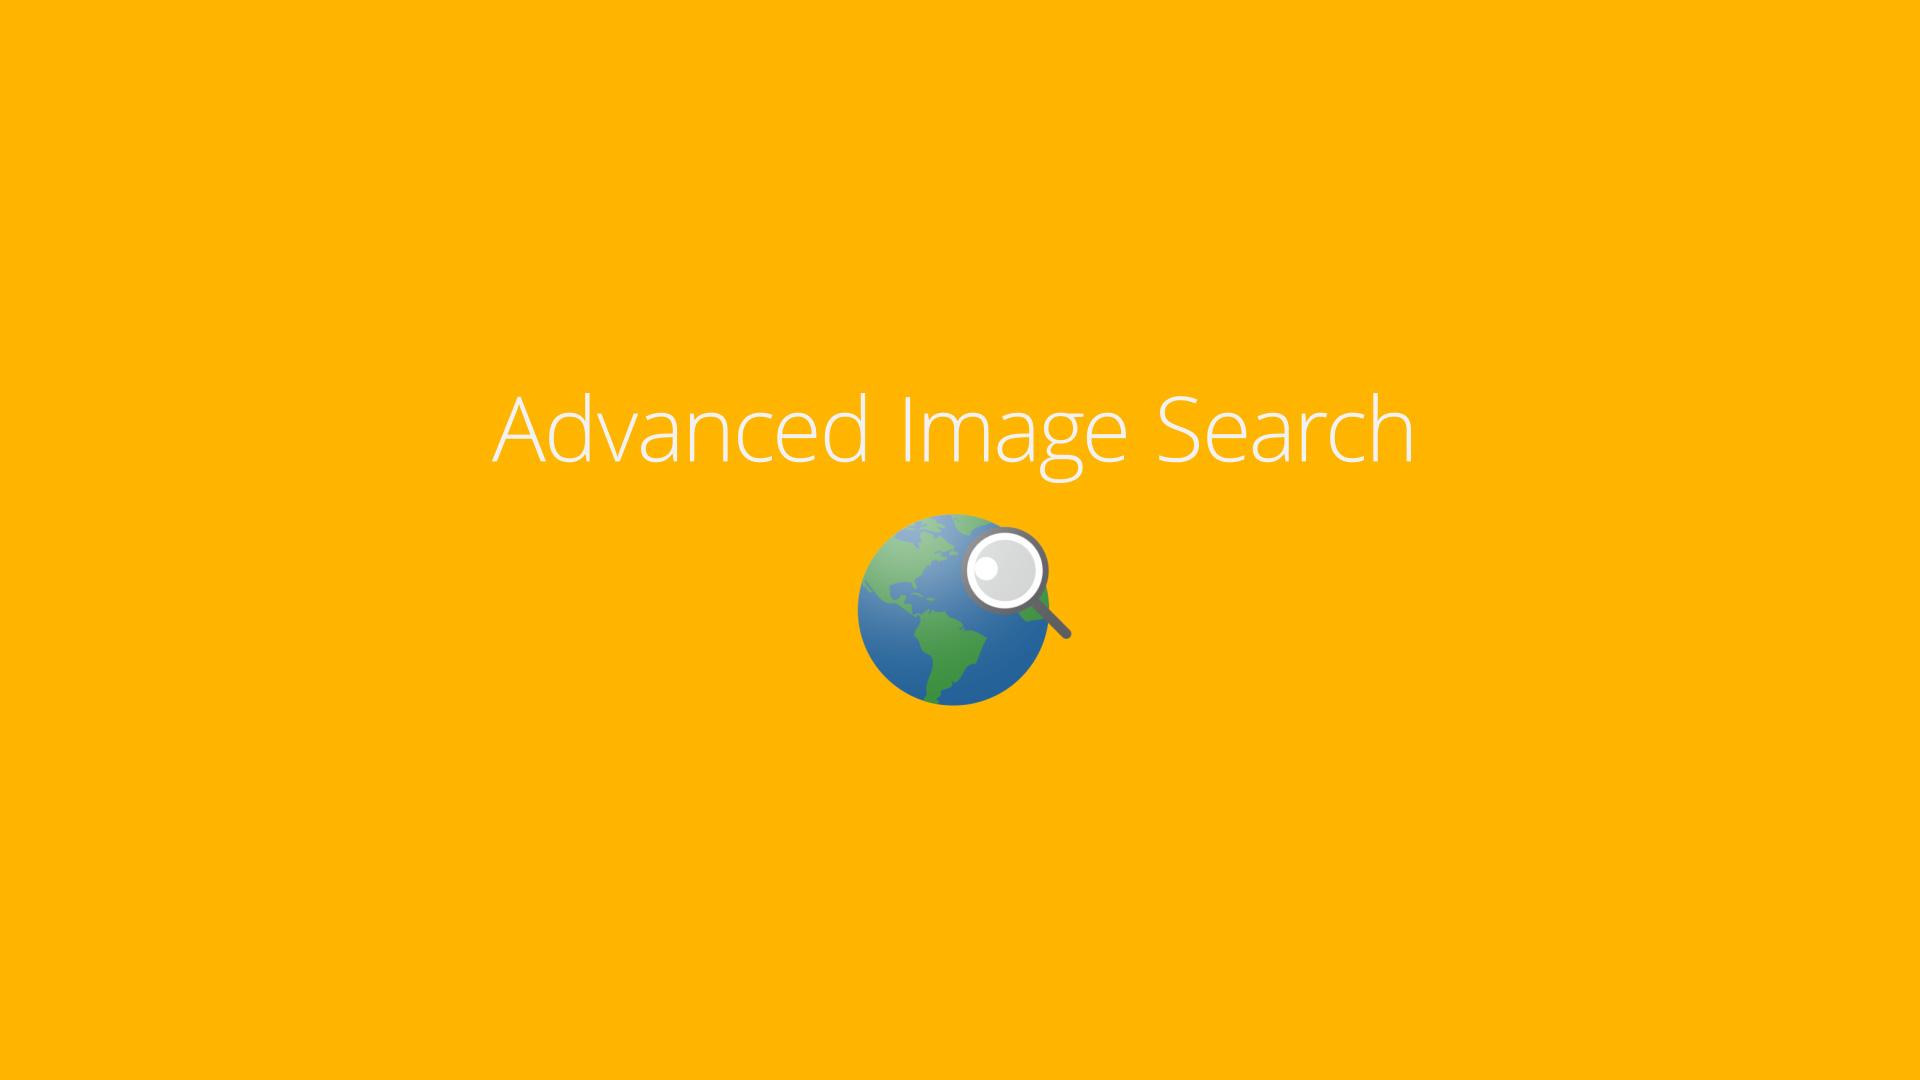 AdvancedImageSearch.jpg